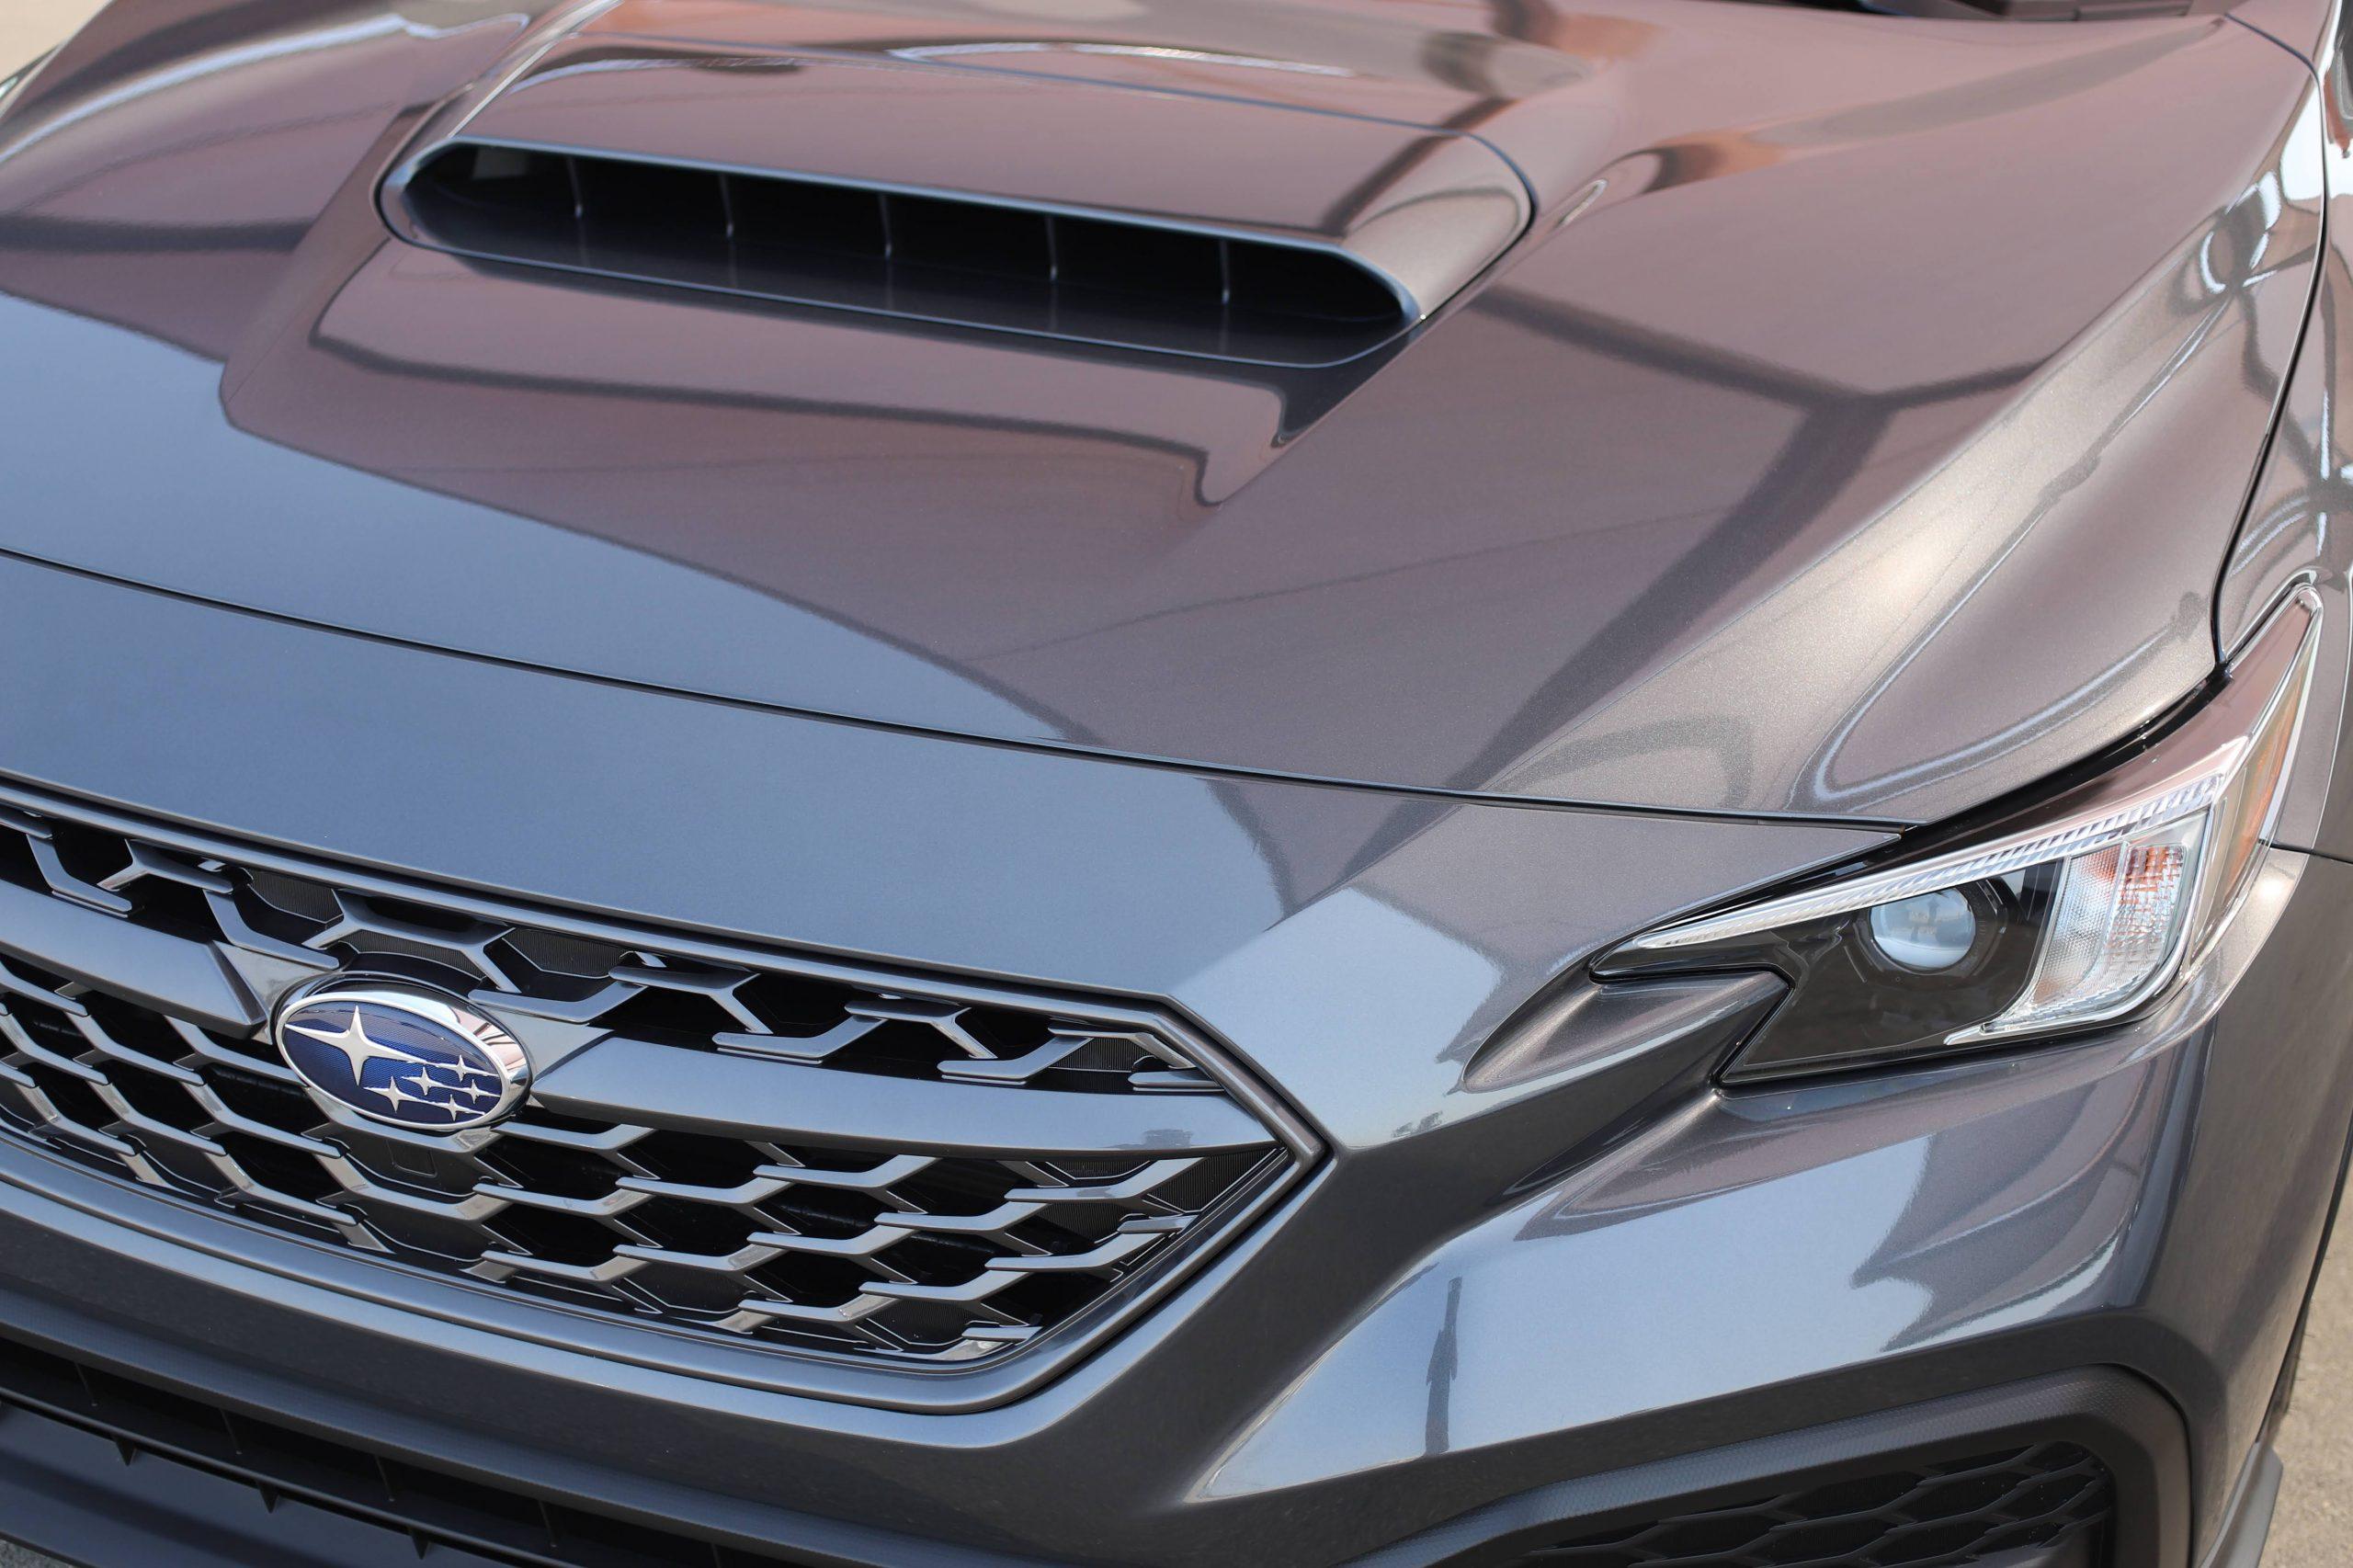 2022 Subaru WRX graphite front end